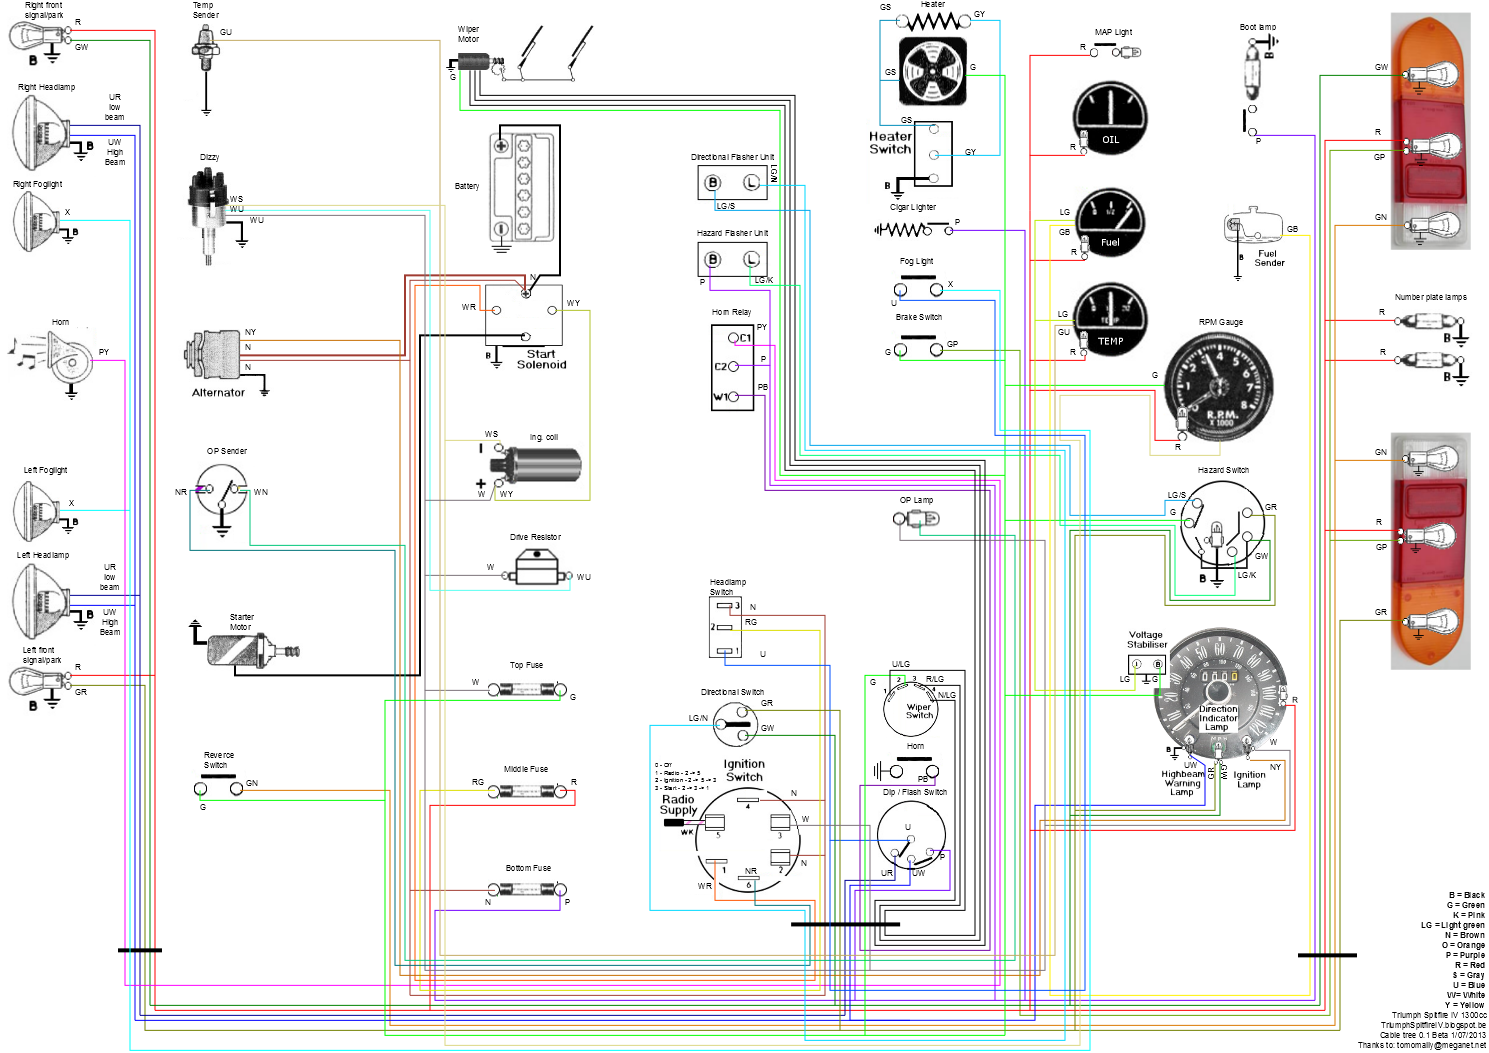 1980 spitfire wiring diagram wiring diagram paper spitfire 1500 wire harness diagram [ 1489 x 1053 Pixel ]